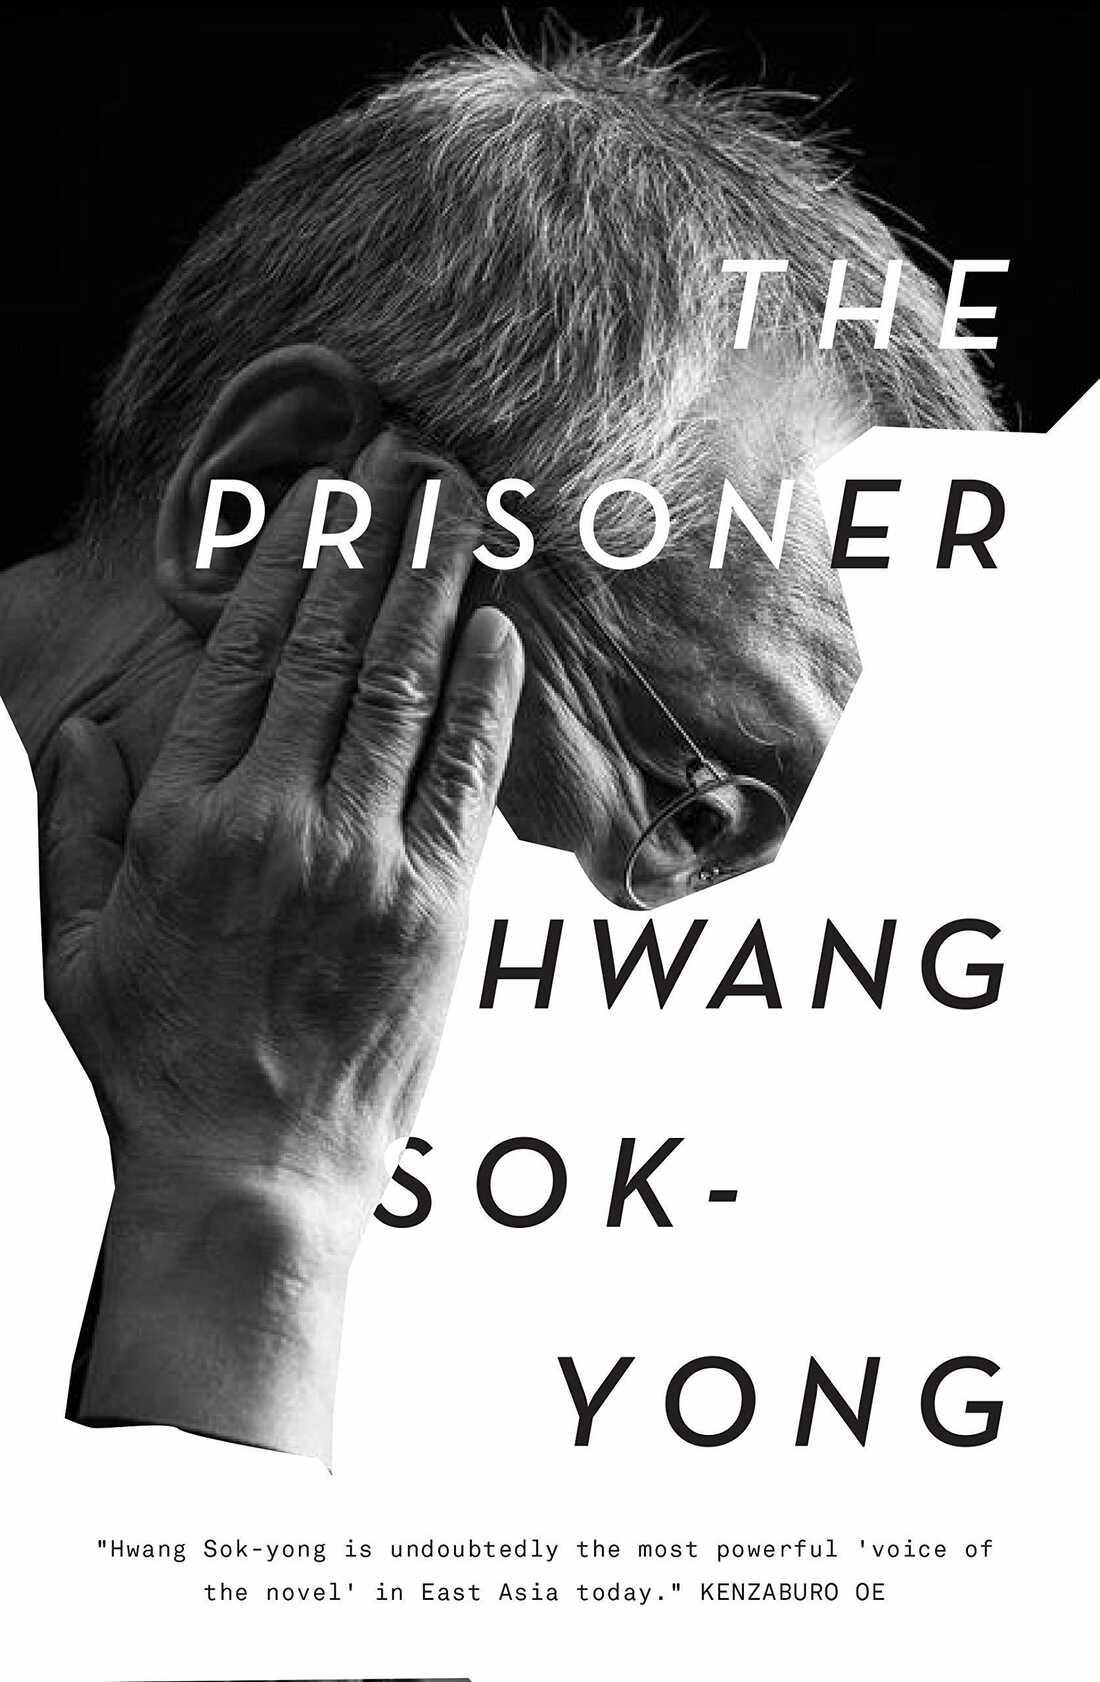 The Prisoner, by Hwang Sok-yong